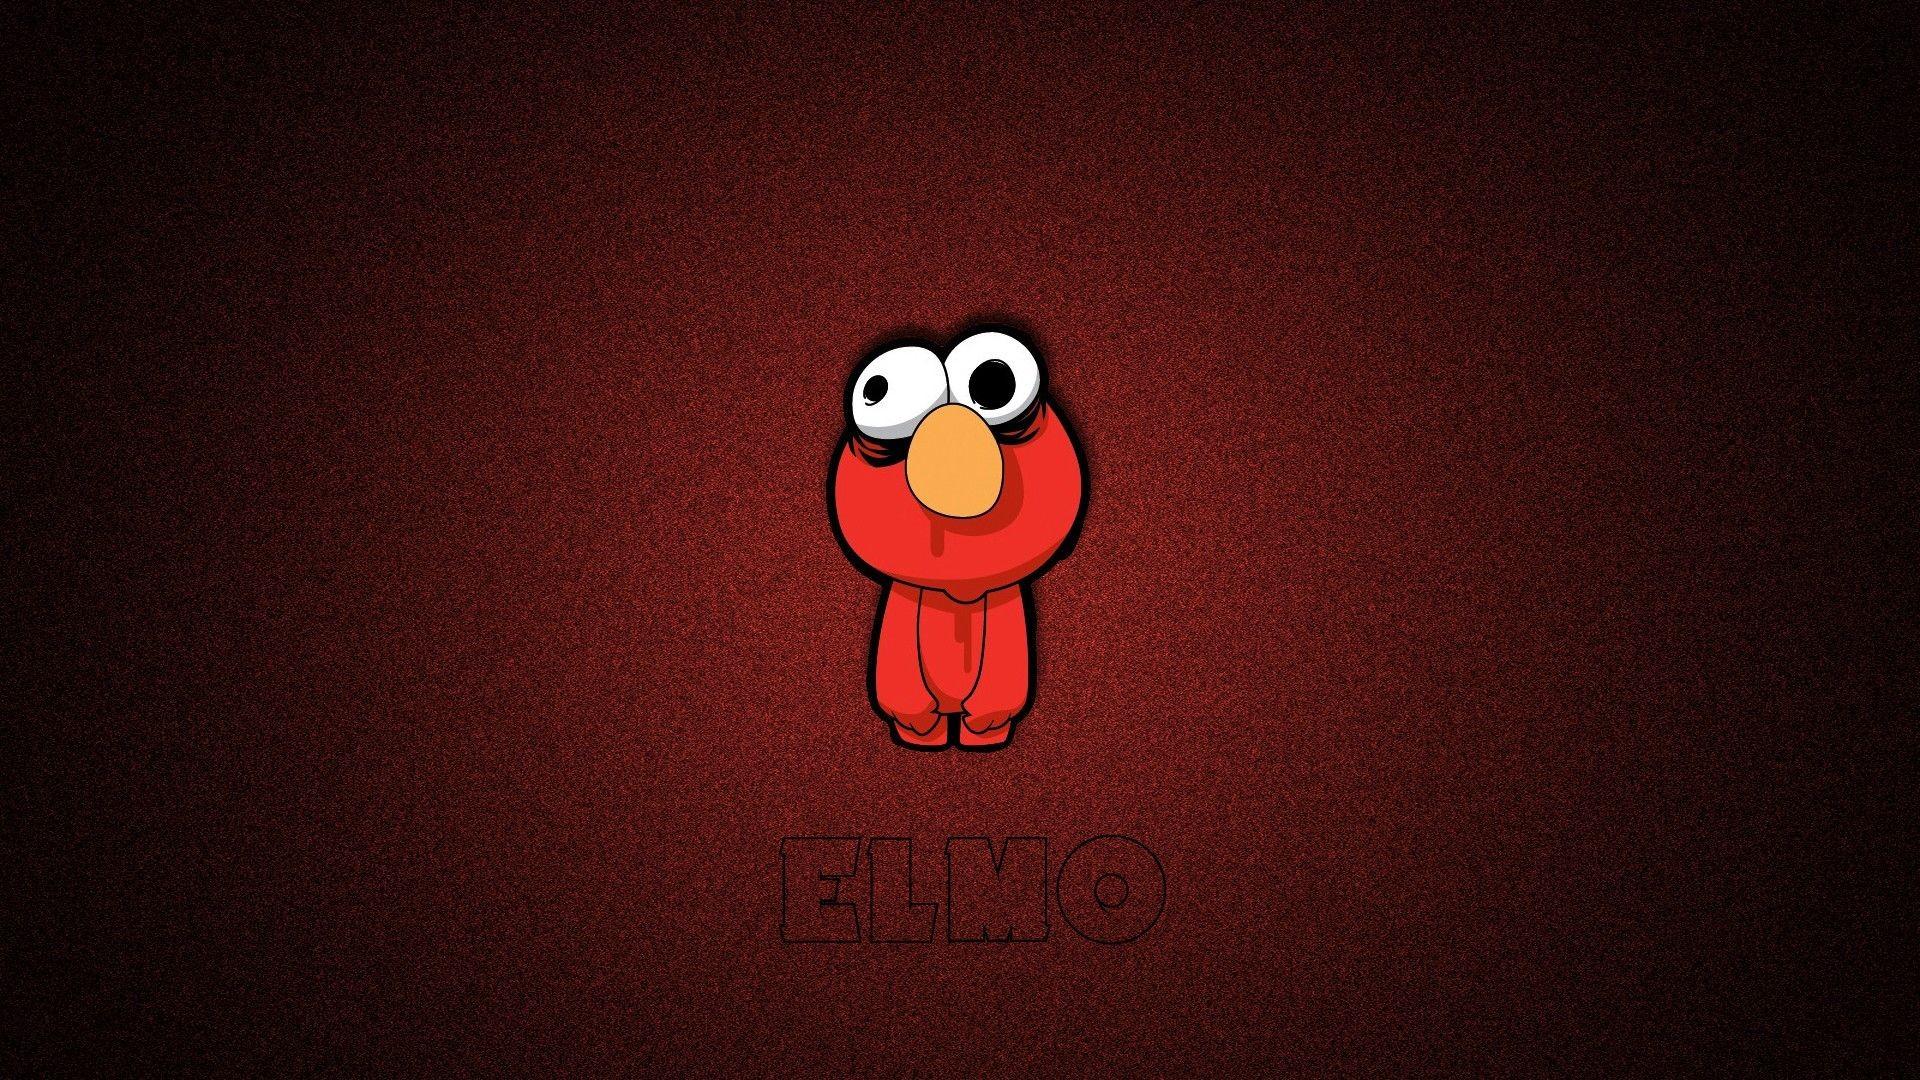 Wallpaper Elmo Tumblr 45+ images